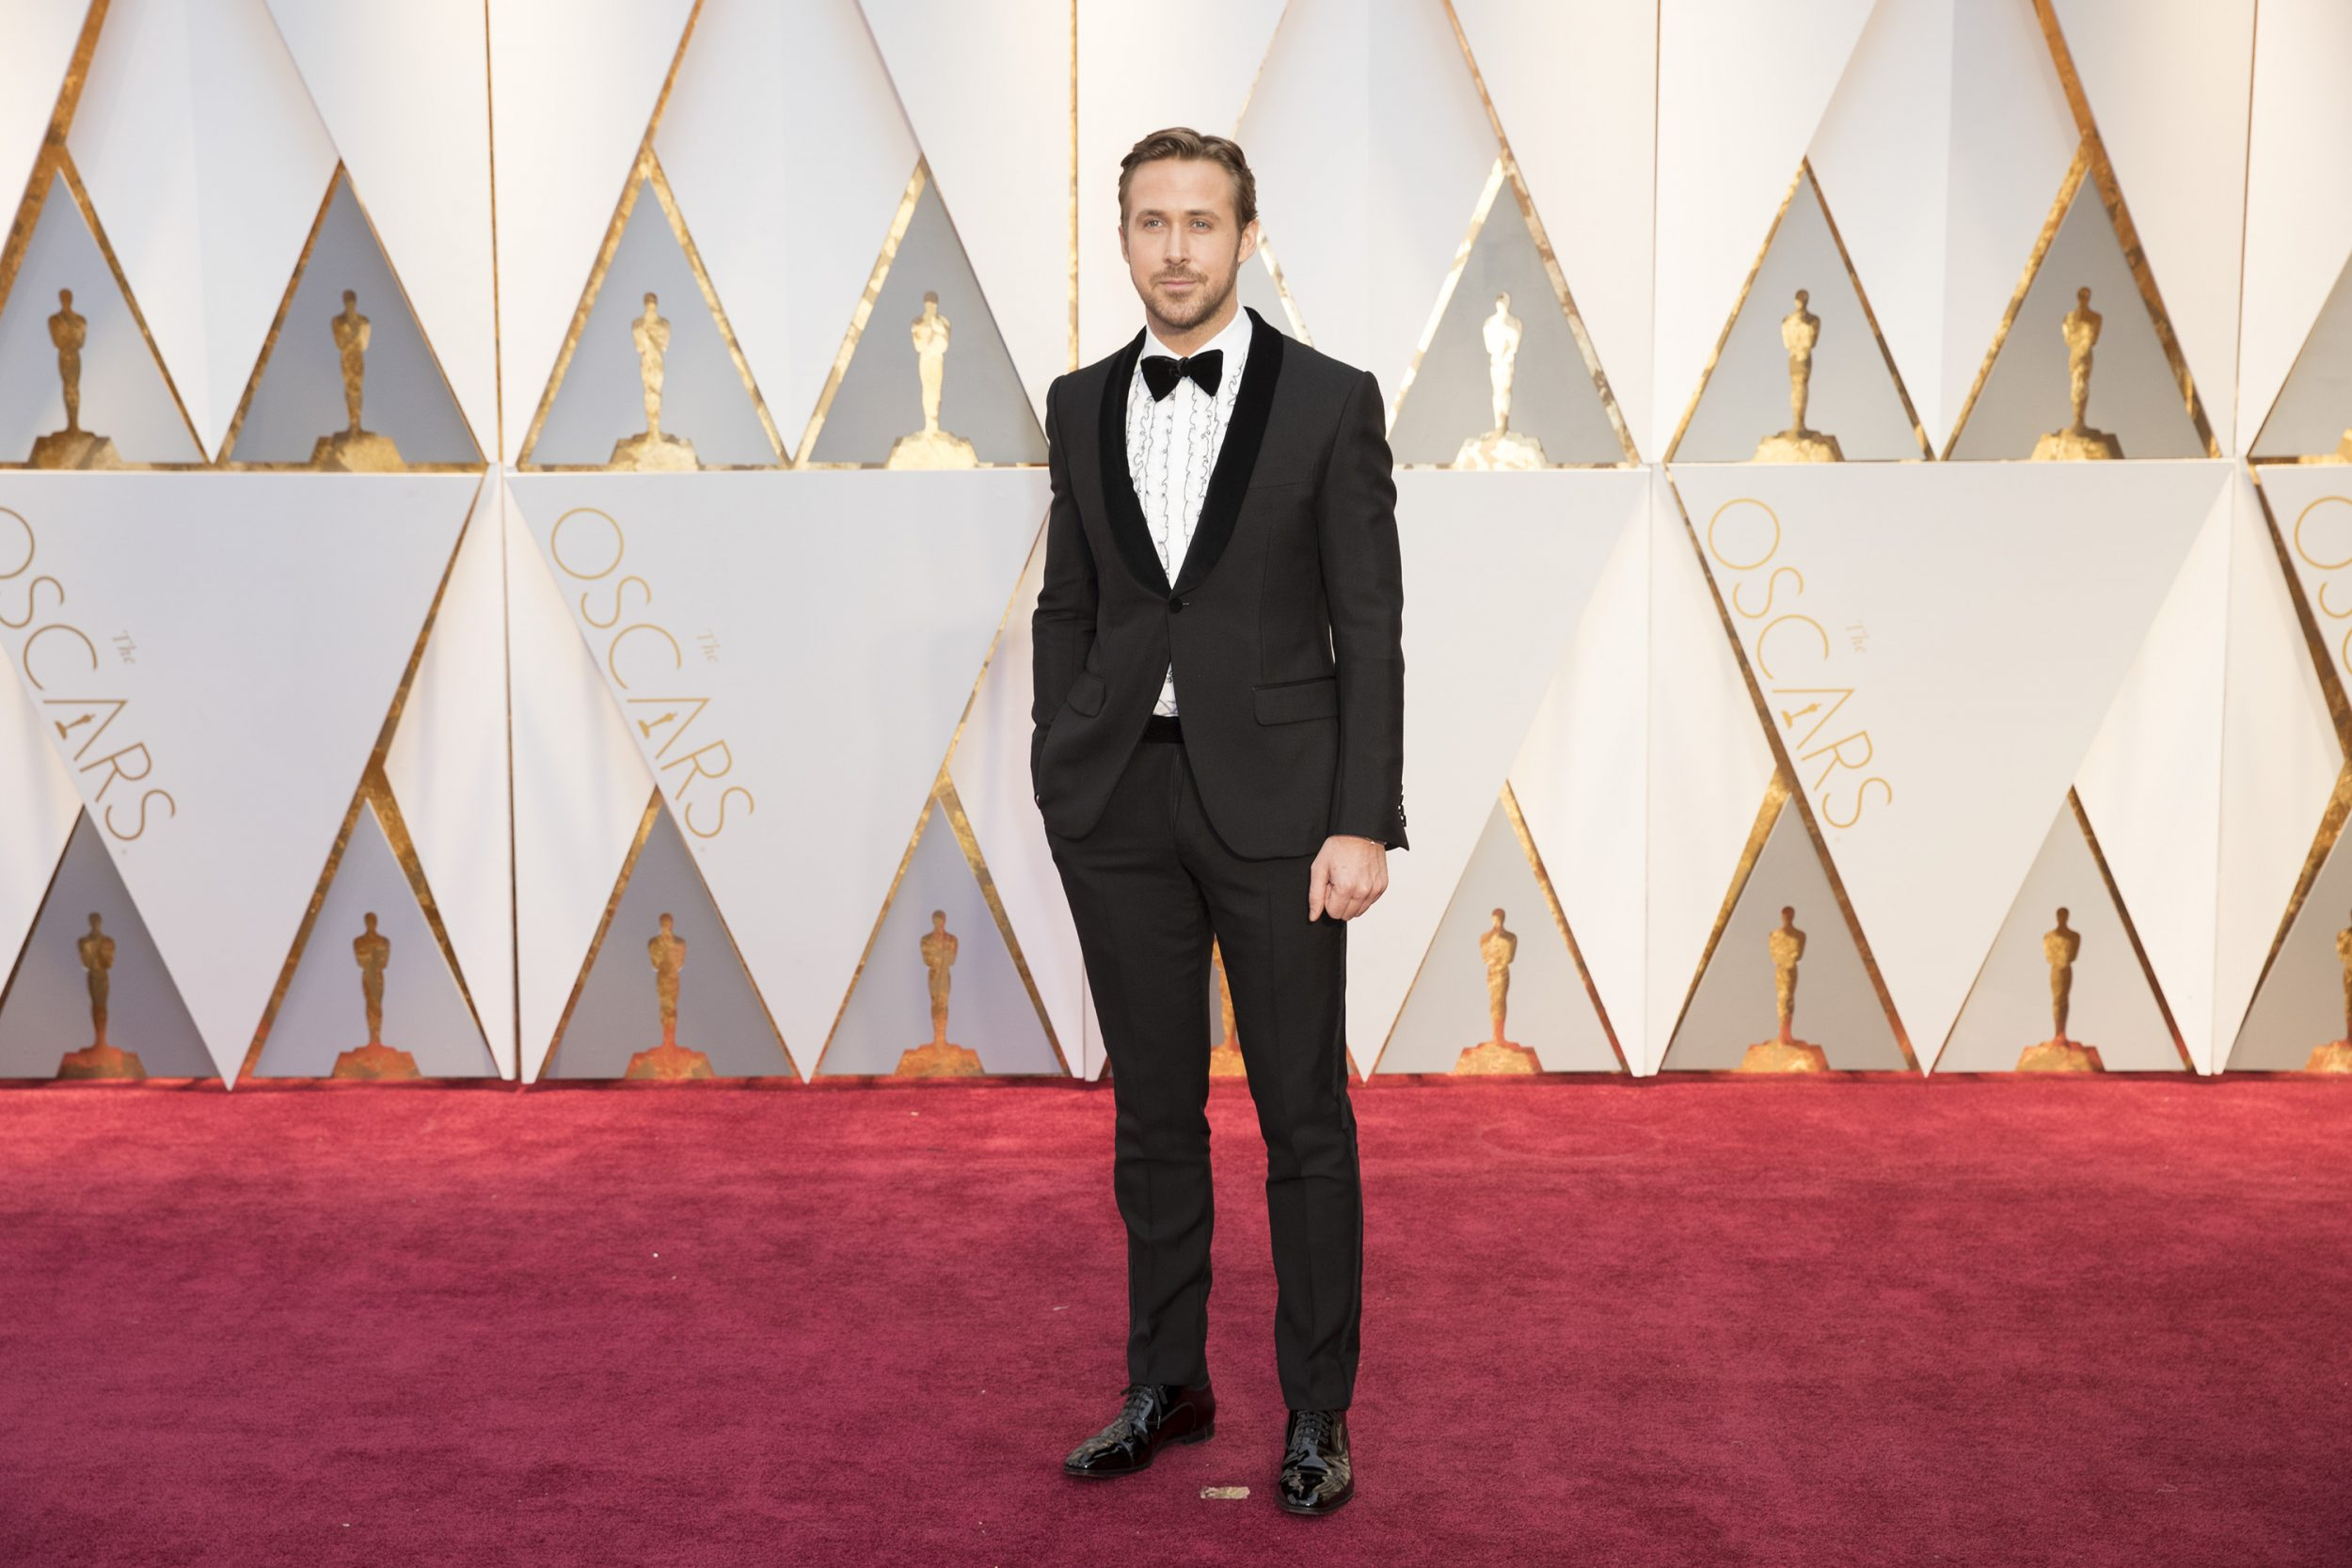 THE OSCARS(r) - The 89th Oscars(r)  broadcasts live on Oscar(r) SUNDAY, FEBRUARY 26, 2017, on the ABC Television Network. (ABC/Tyler Golden) RYAN GOSLING